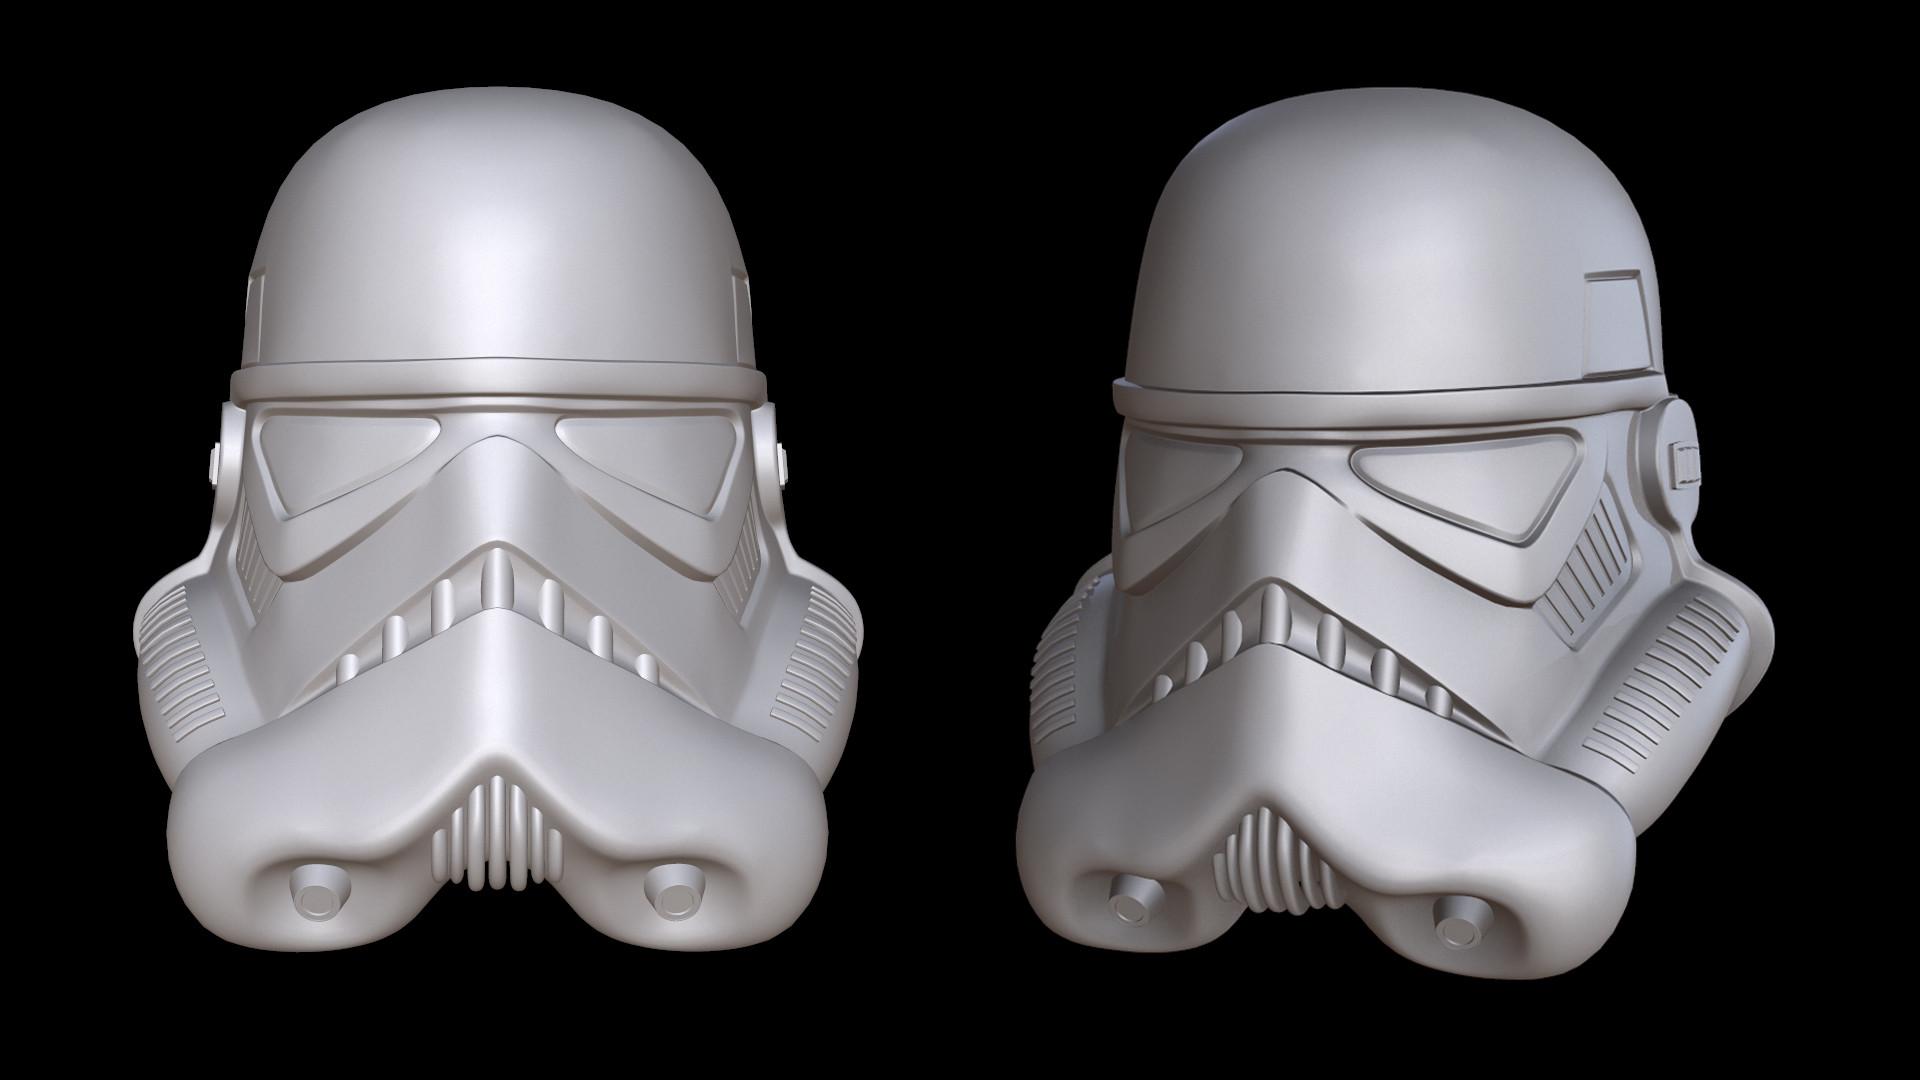 Stormtrooper Helmet - Hardsurface